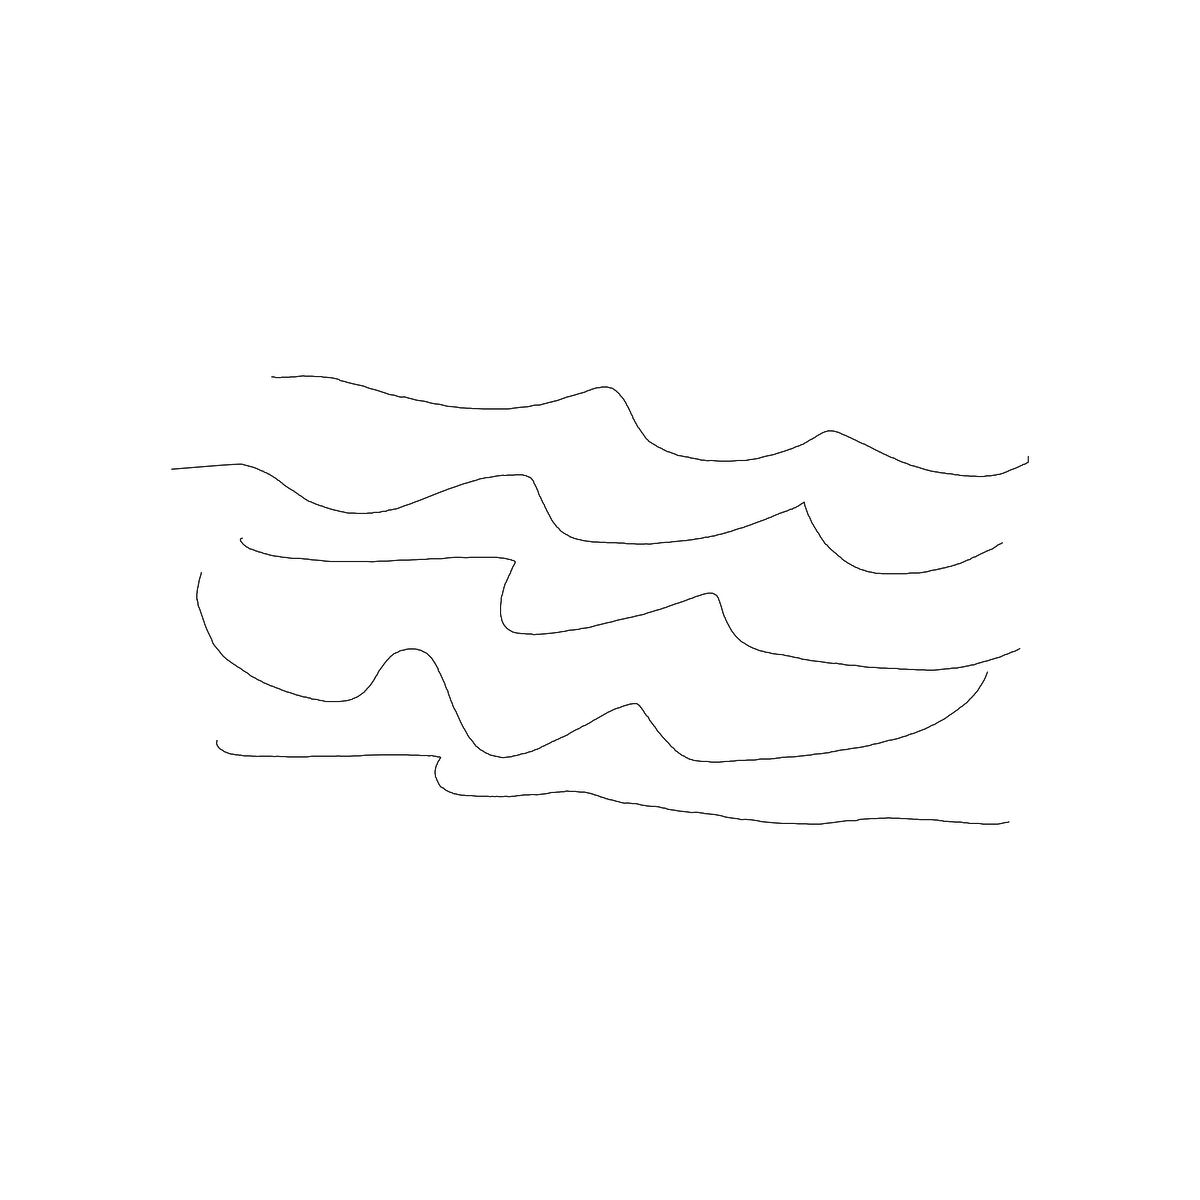 BAAAM drawing#23458 lat:50.9735336303710940lng: 1.8398295640945435